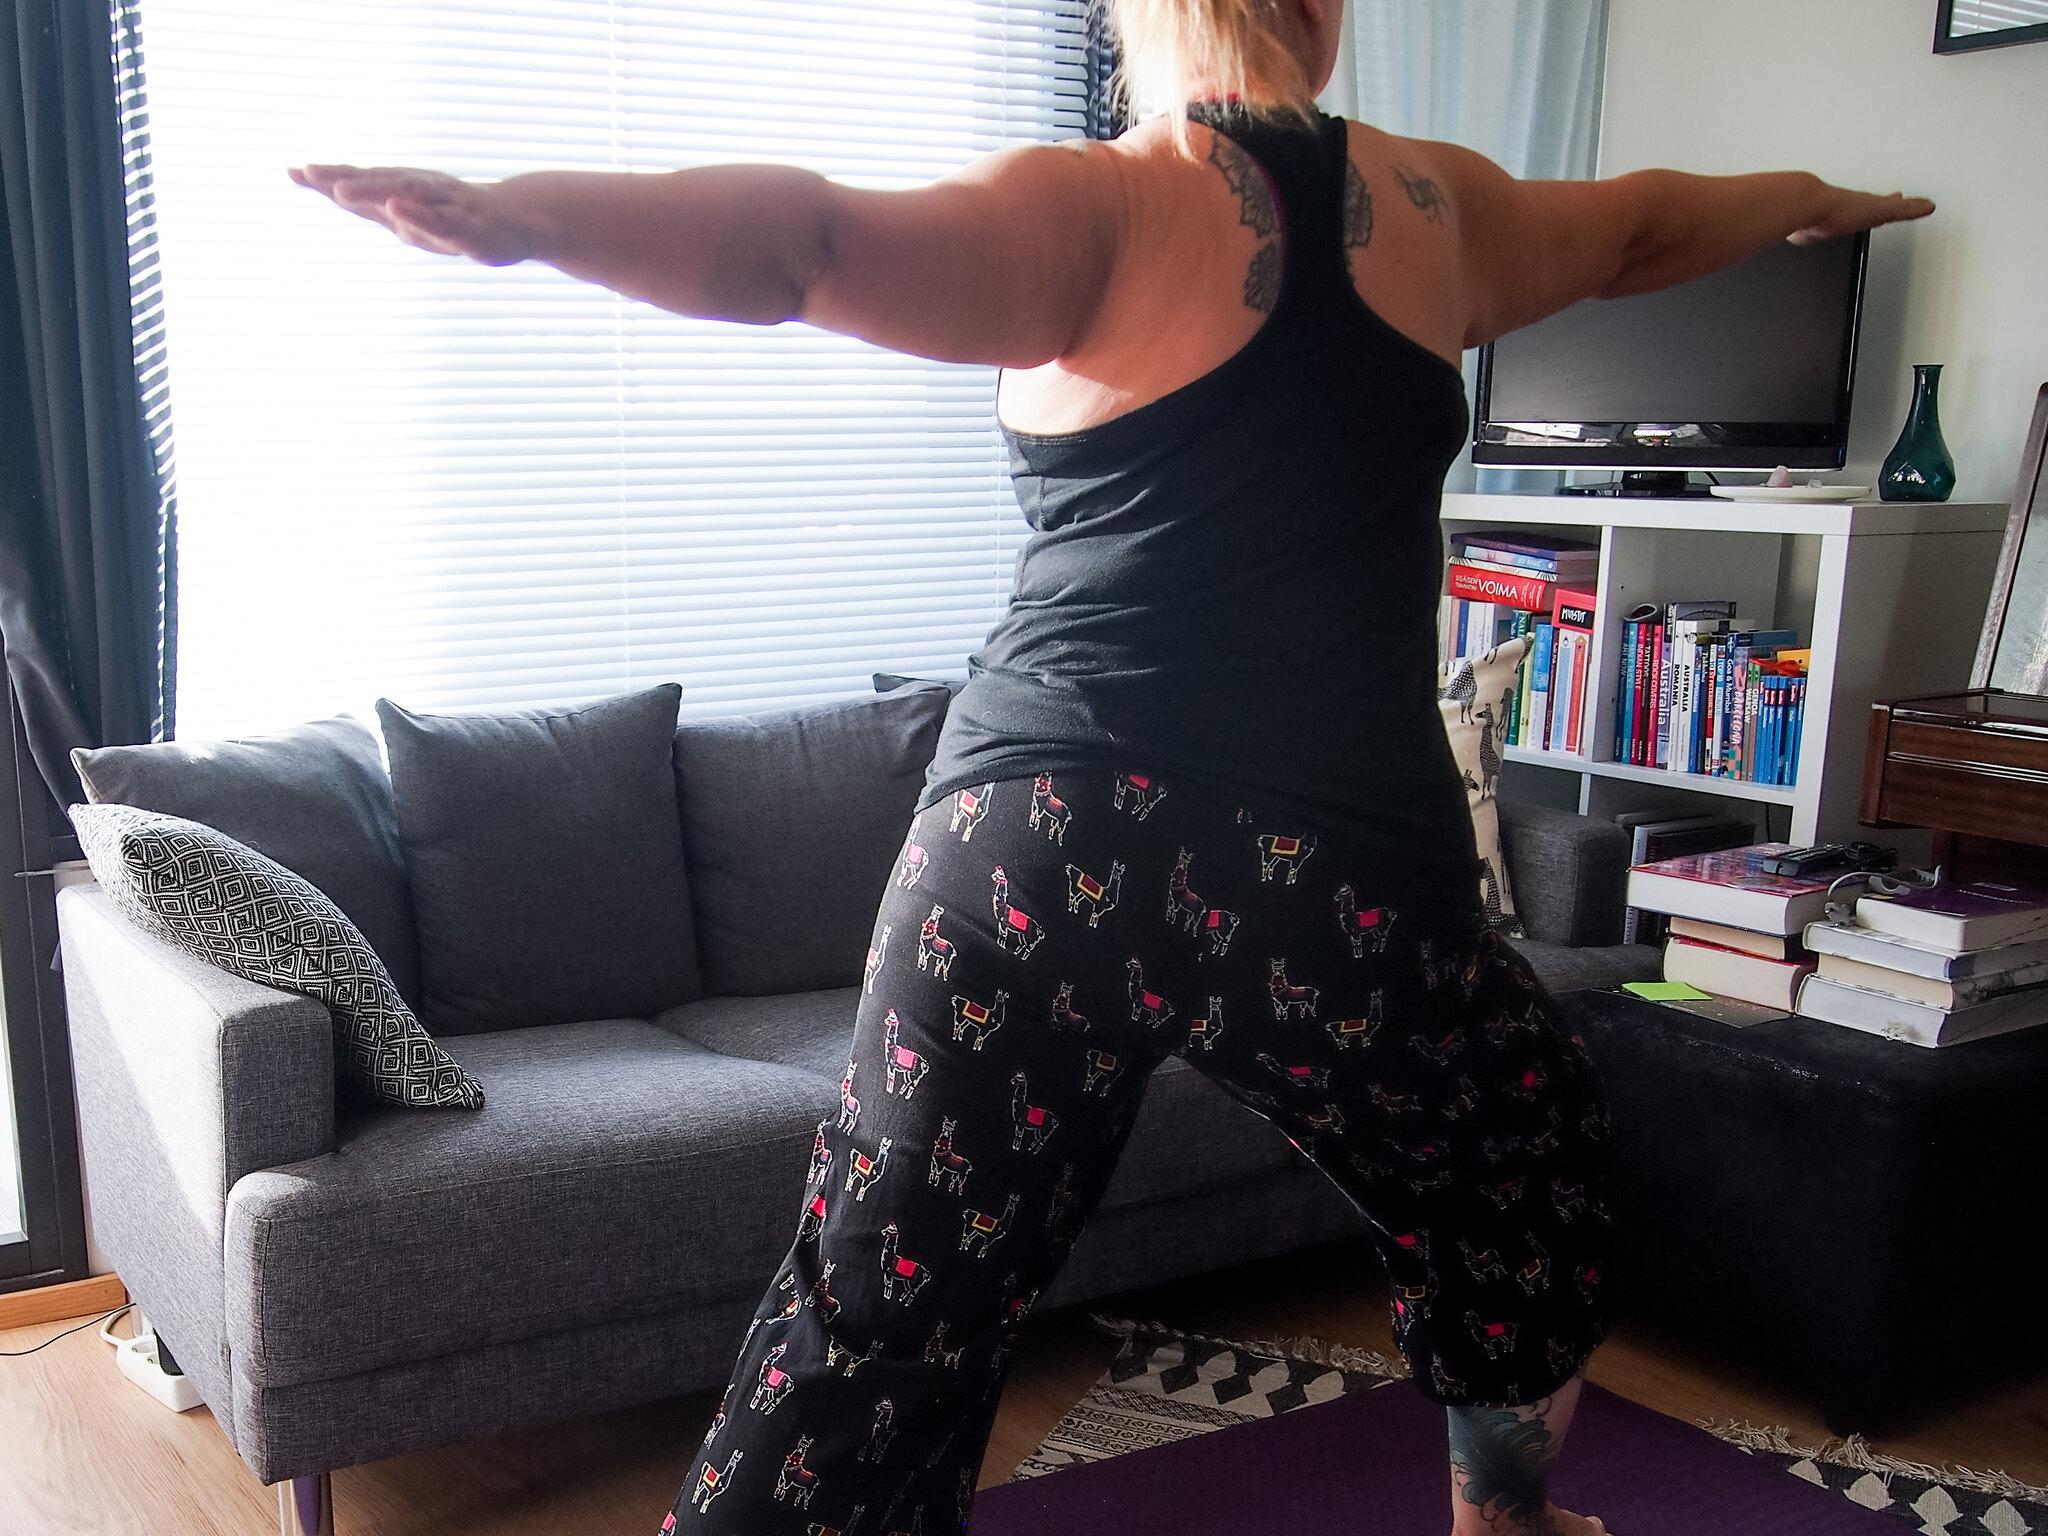 yoga_annukka_vuorela